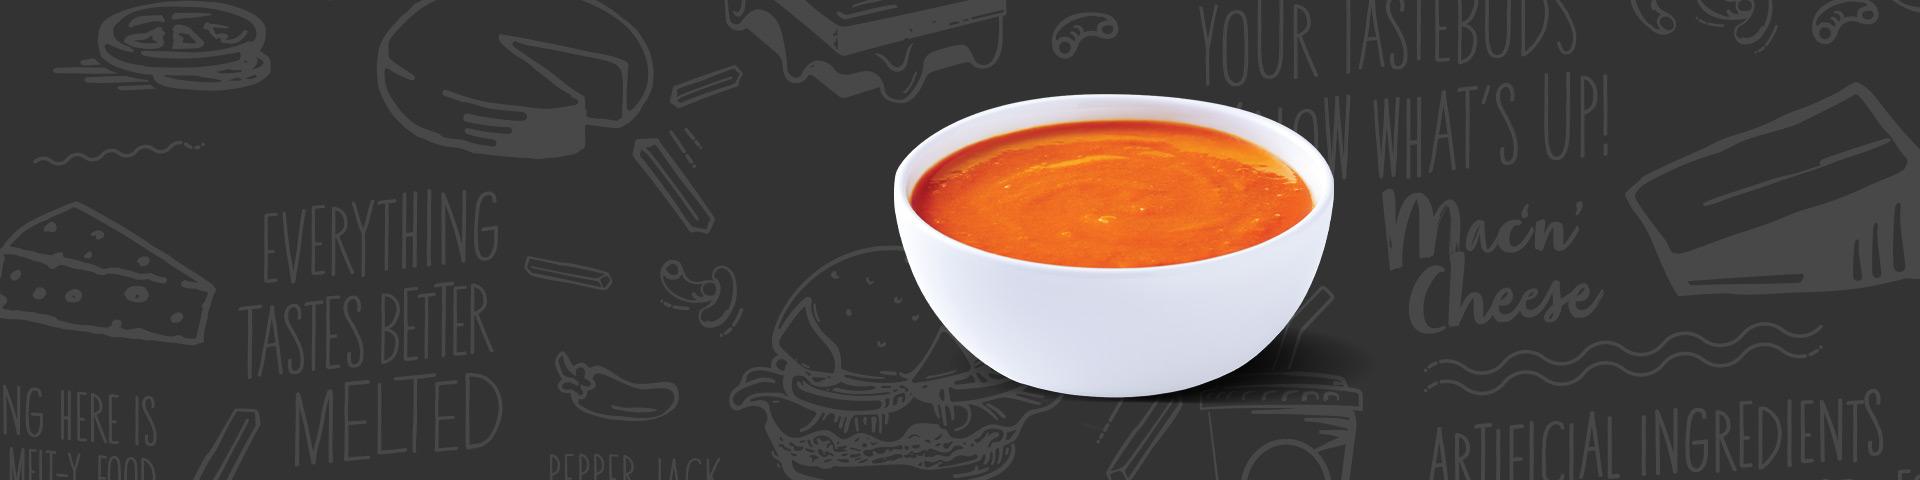 TomatoSoup-strip-01